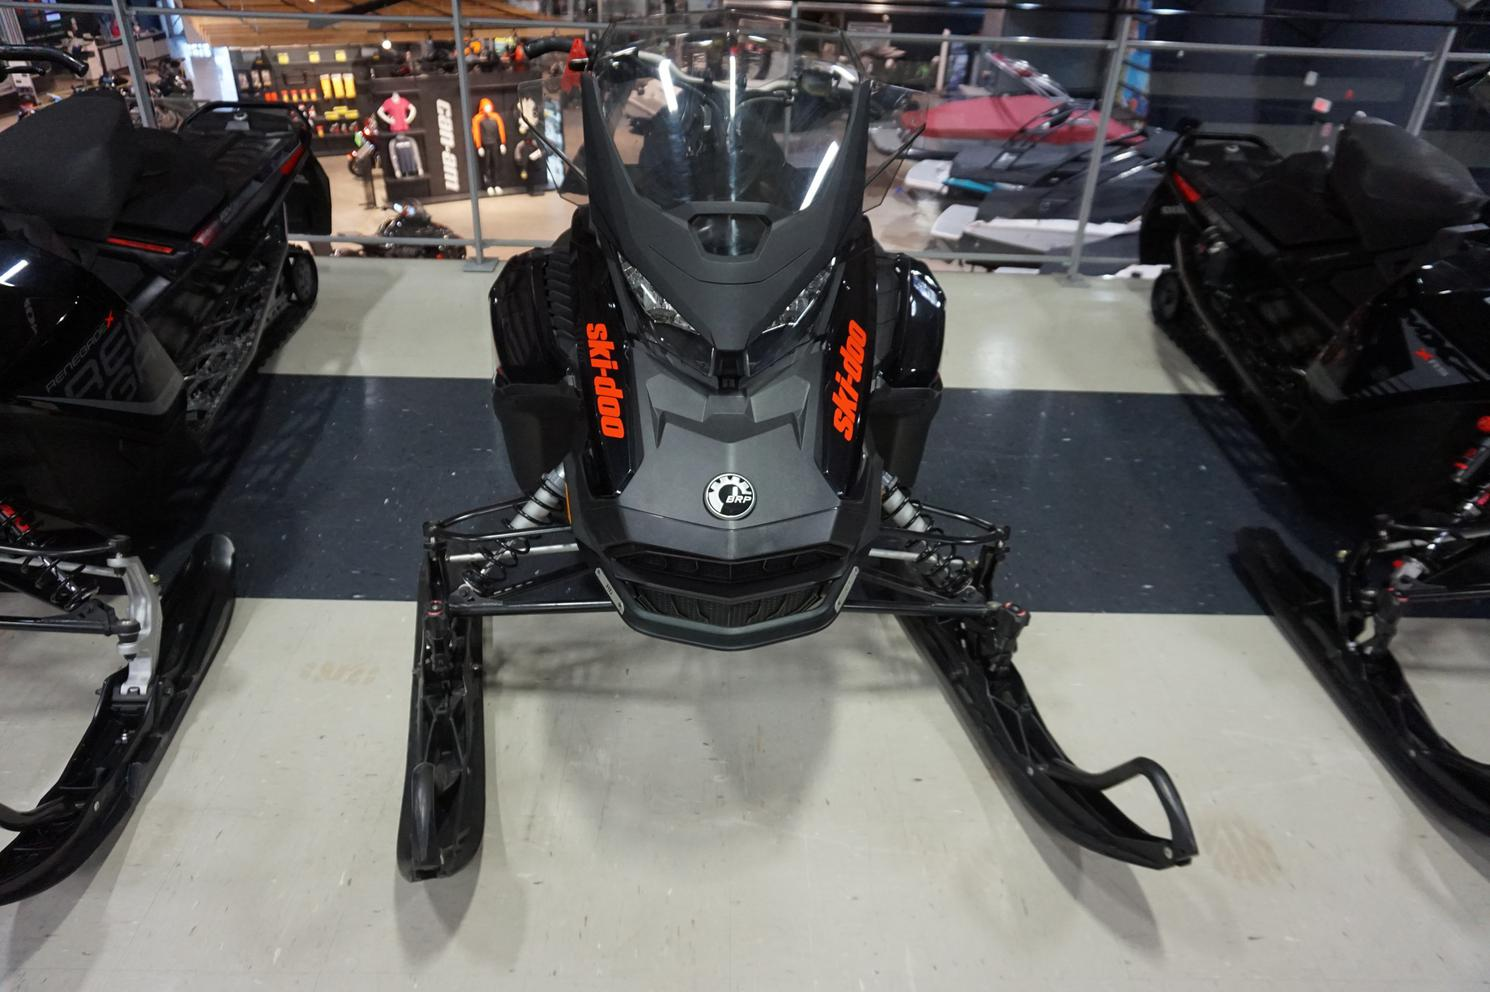 Ski-Doo Renegade Enduro 900 Ace 2019